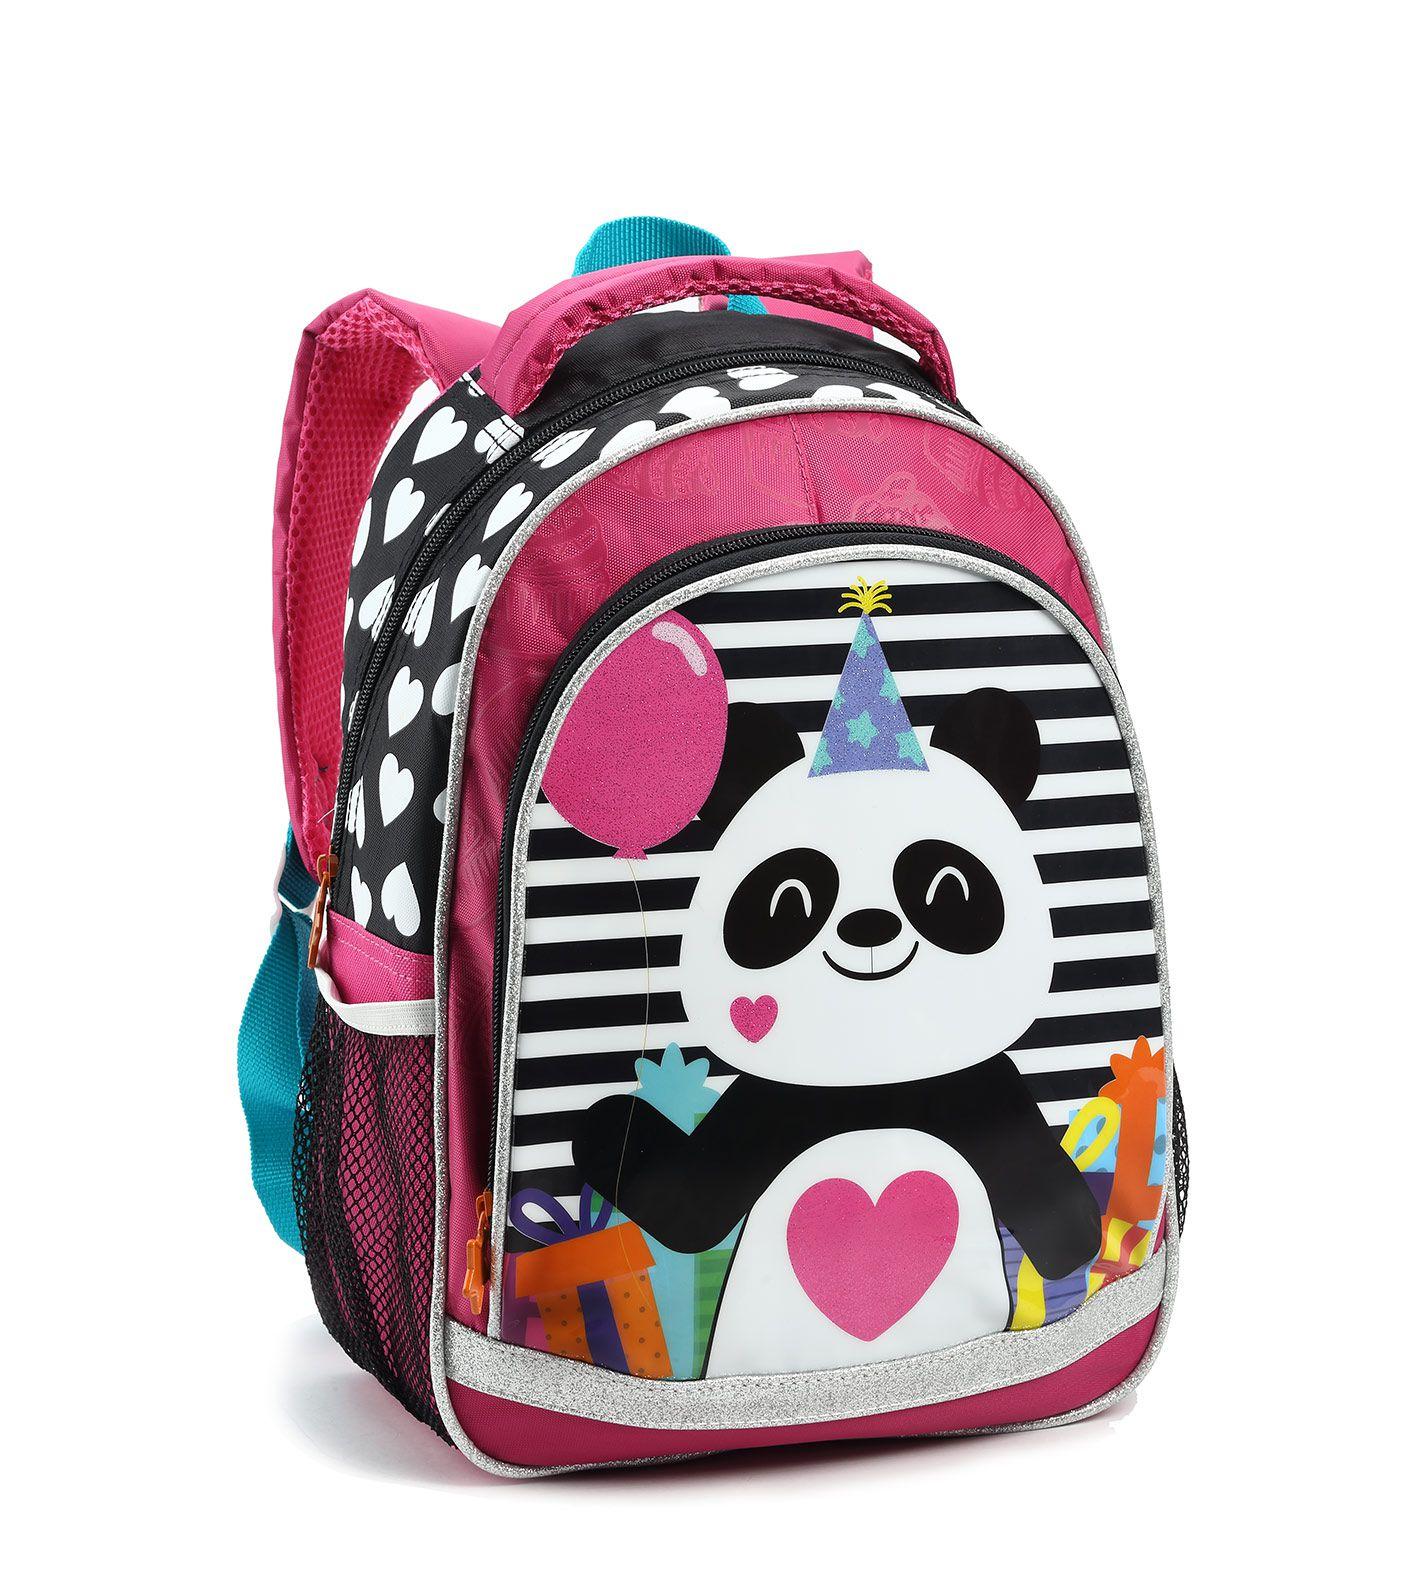 Mochila Infantil Costas Panda Fofa Feminina 14489 Pequena